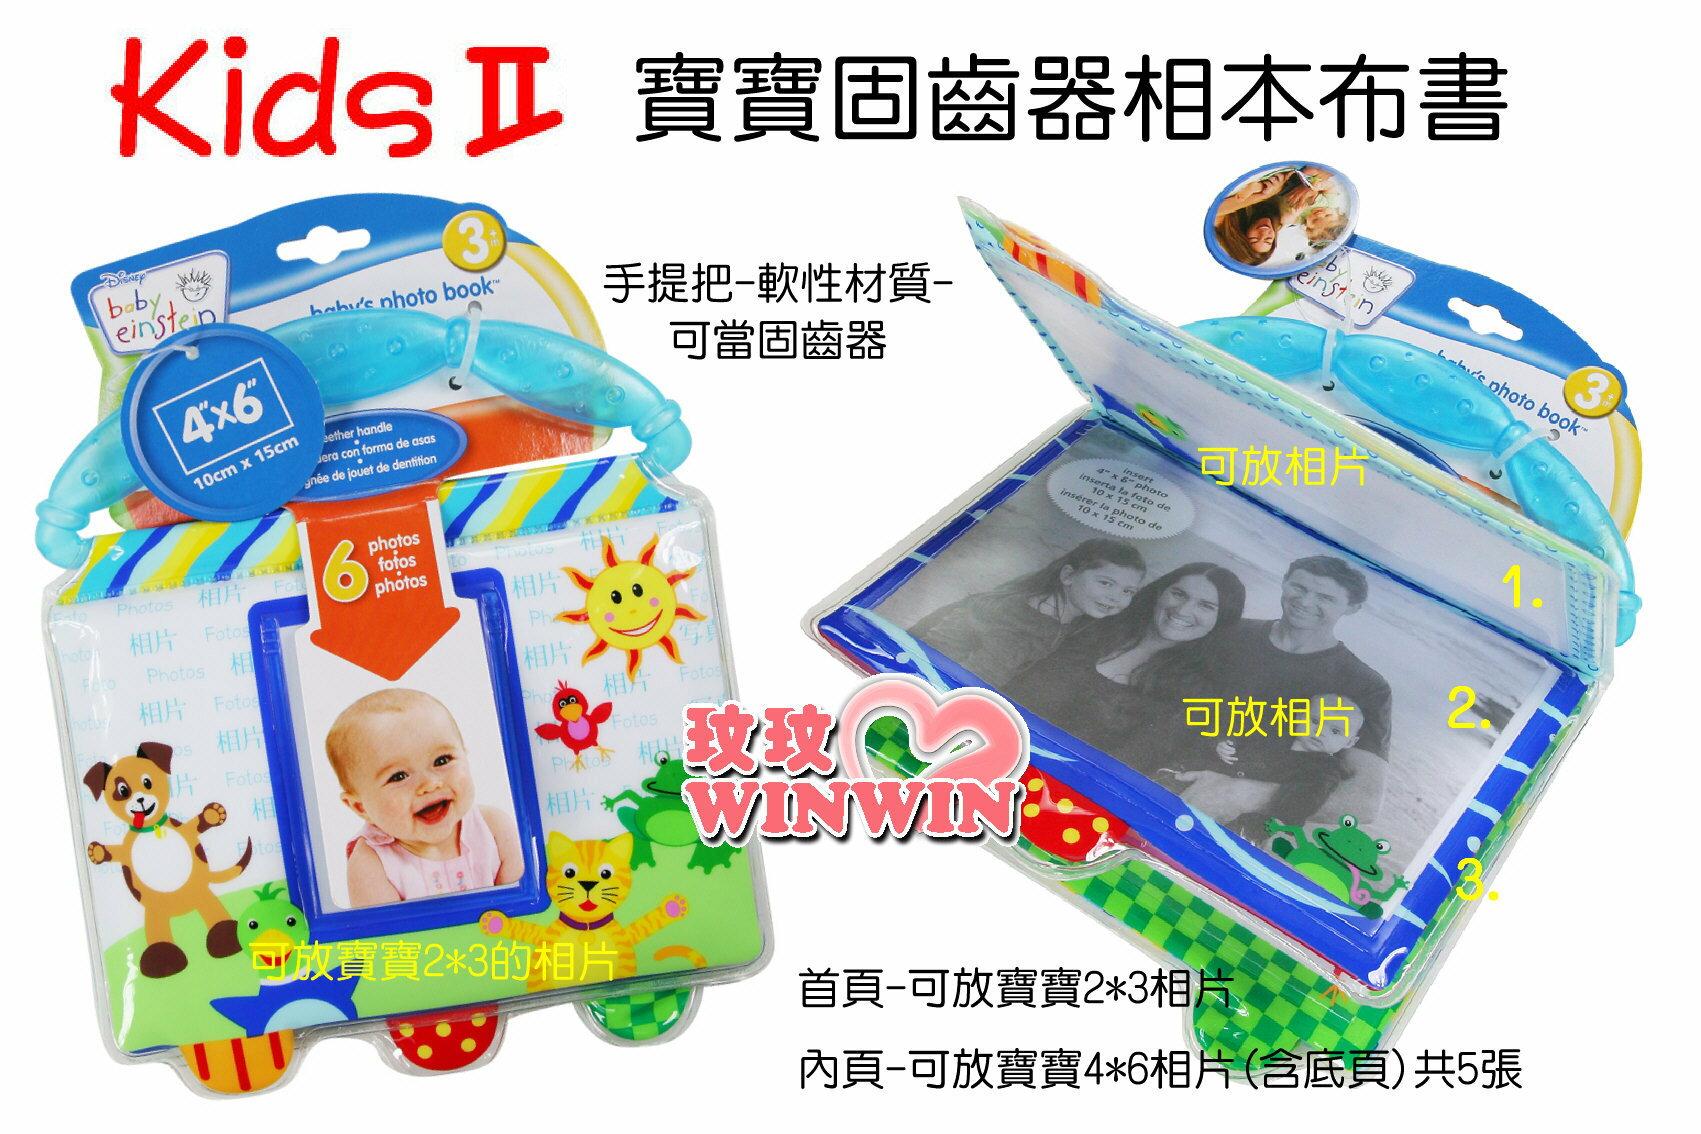 Kids-II 「KI-08845小蜜蜂固齒器相本布書」「KI-30701寶寶固齒器相本布書」2款可選